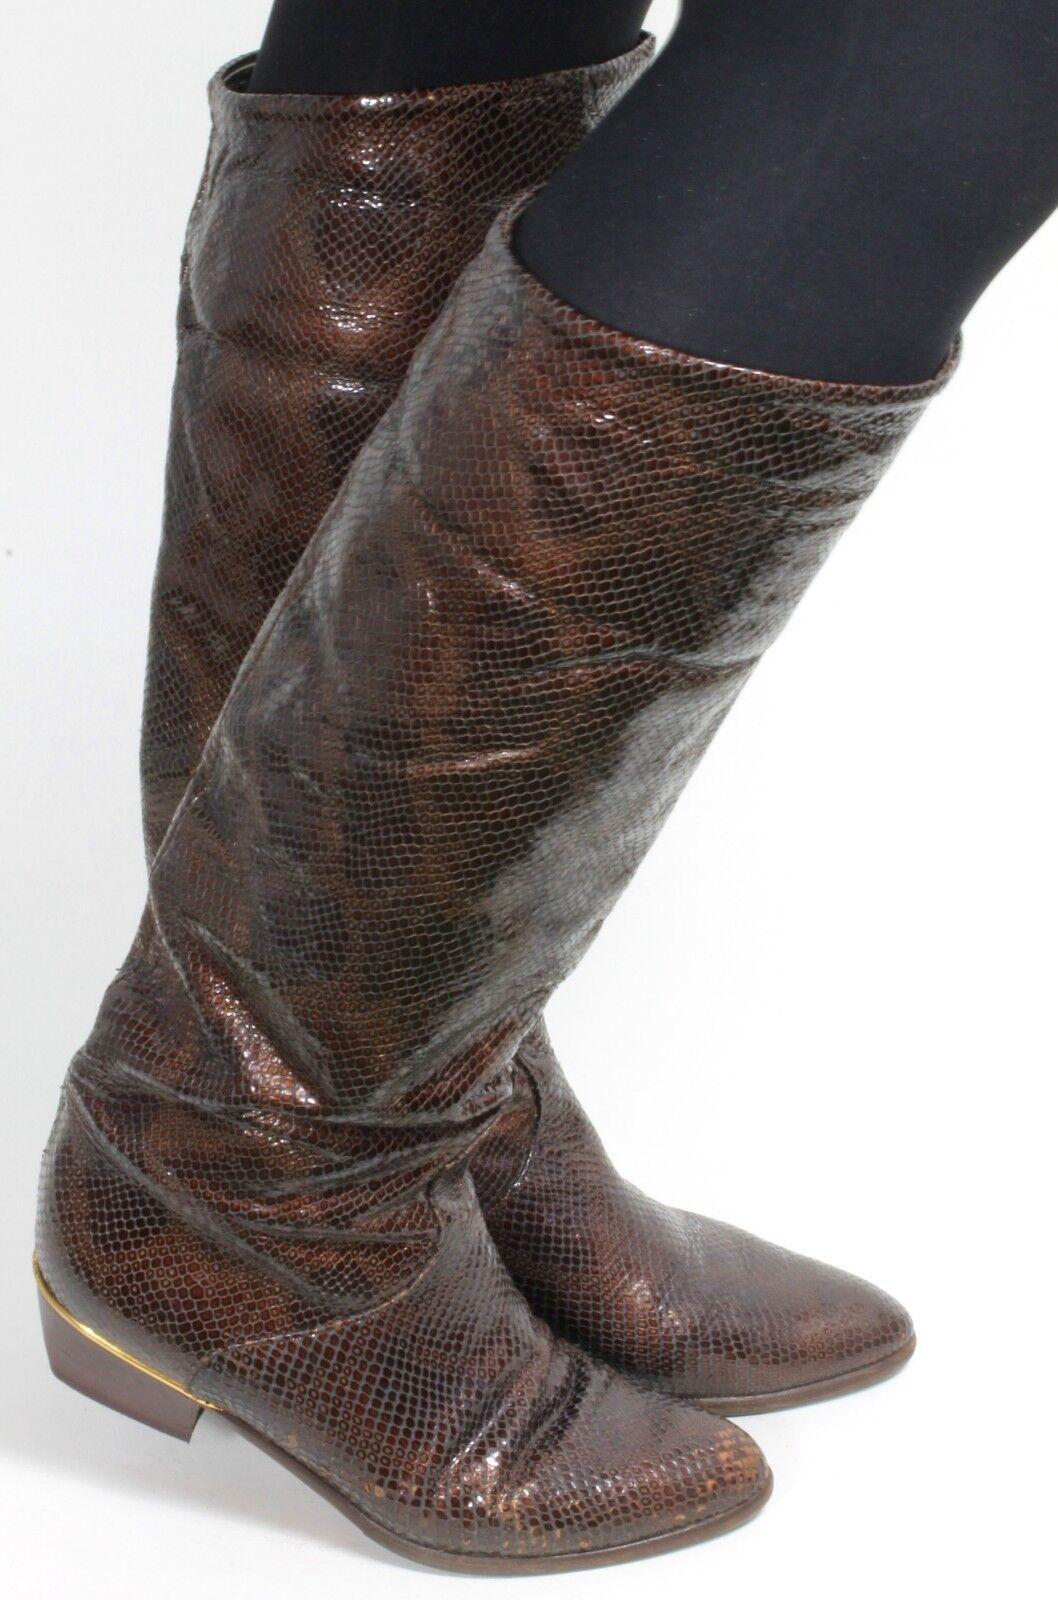 Damenstiefel Vintage Stiefel Blogger Hipster Flats Reptil Metallic Brunella 38